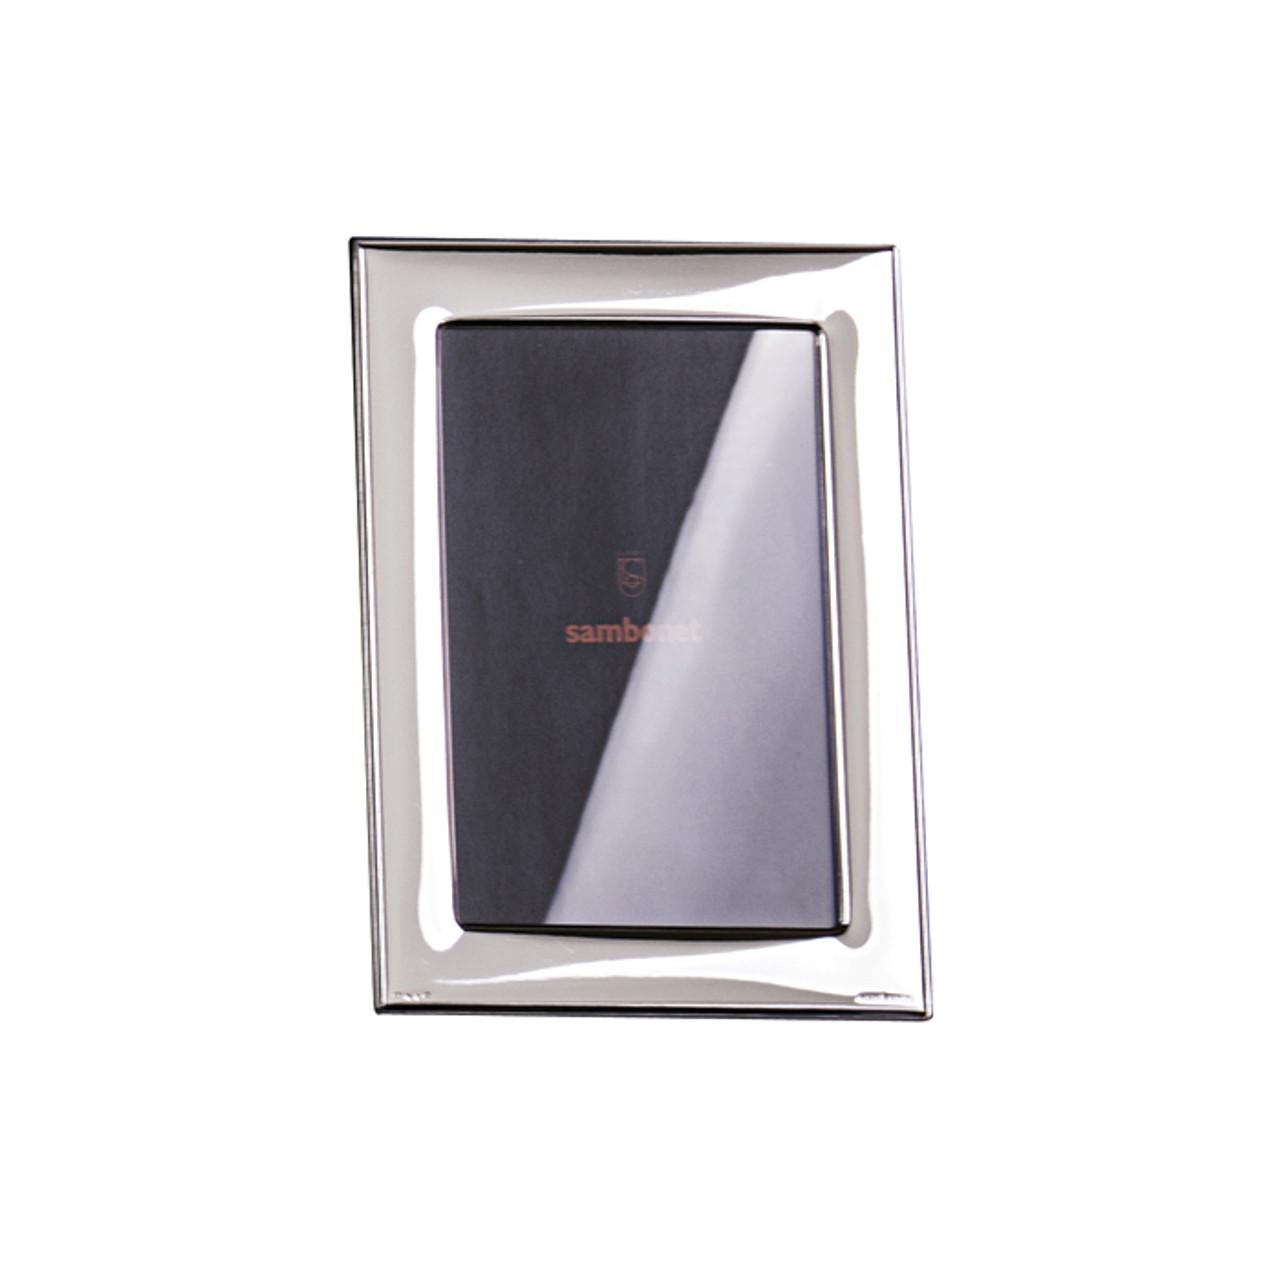 Frames Flat Frame, 3 1/2 x 5 inch | Sambonet Online Store